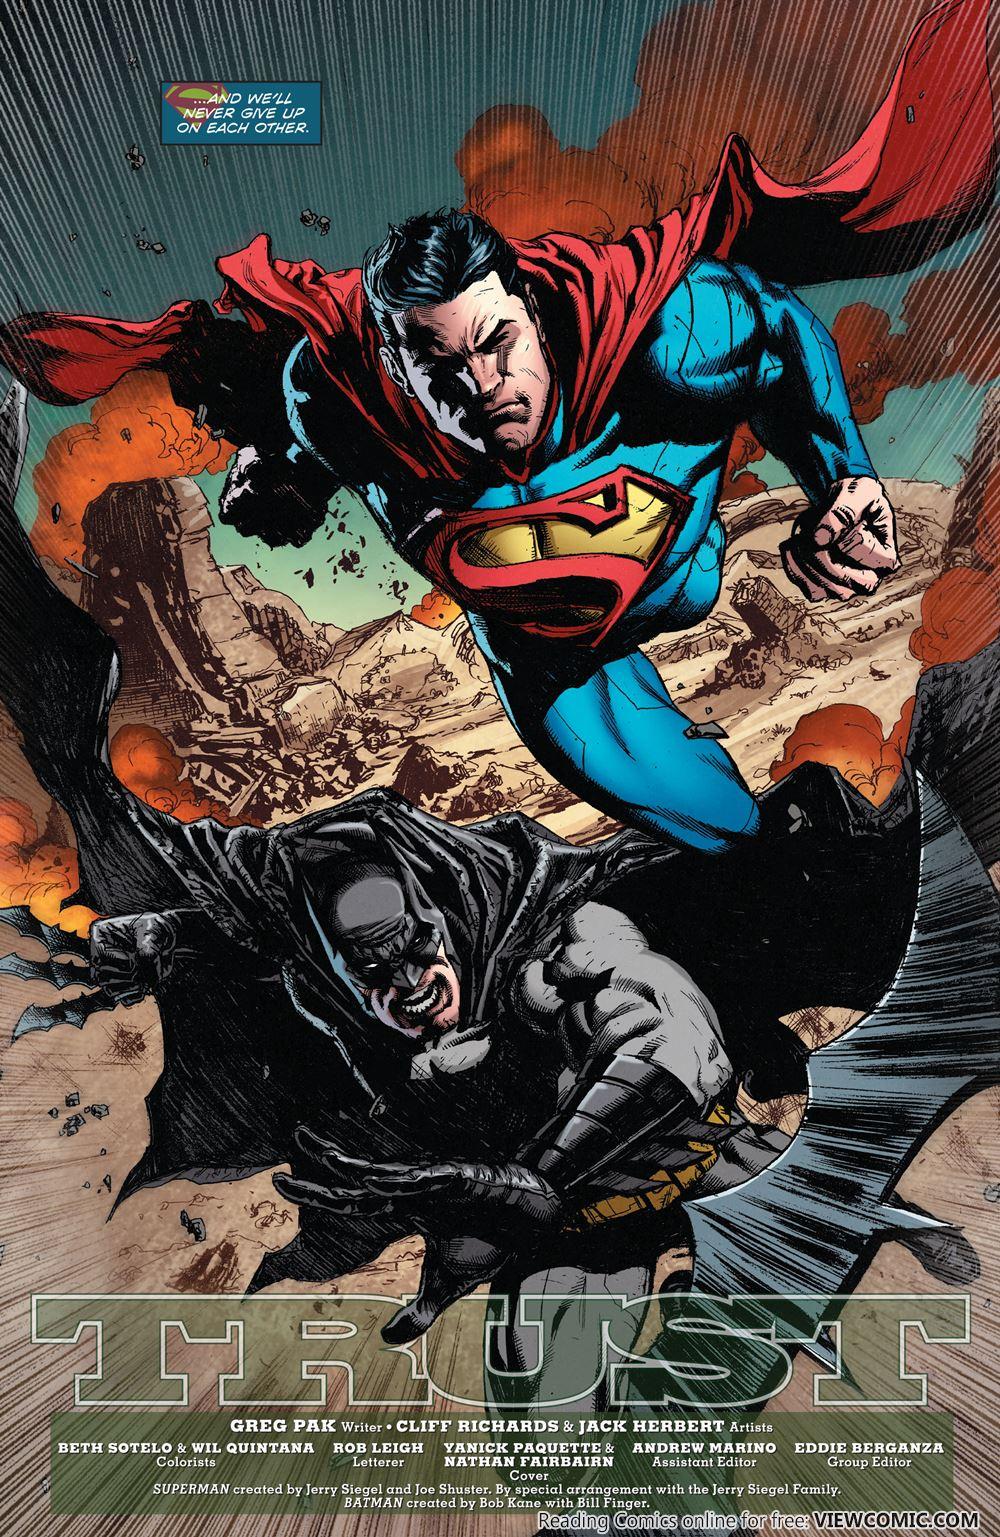 batman superman viewcomic reading comics online for free 2018